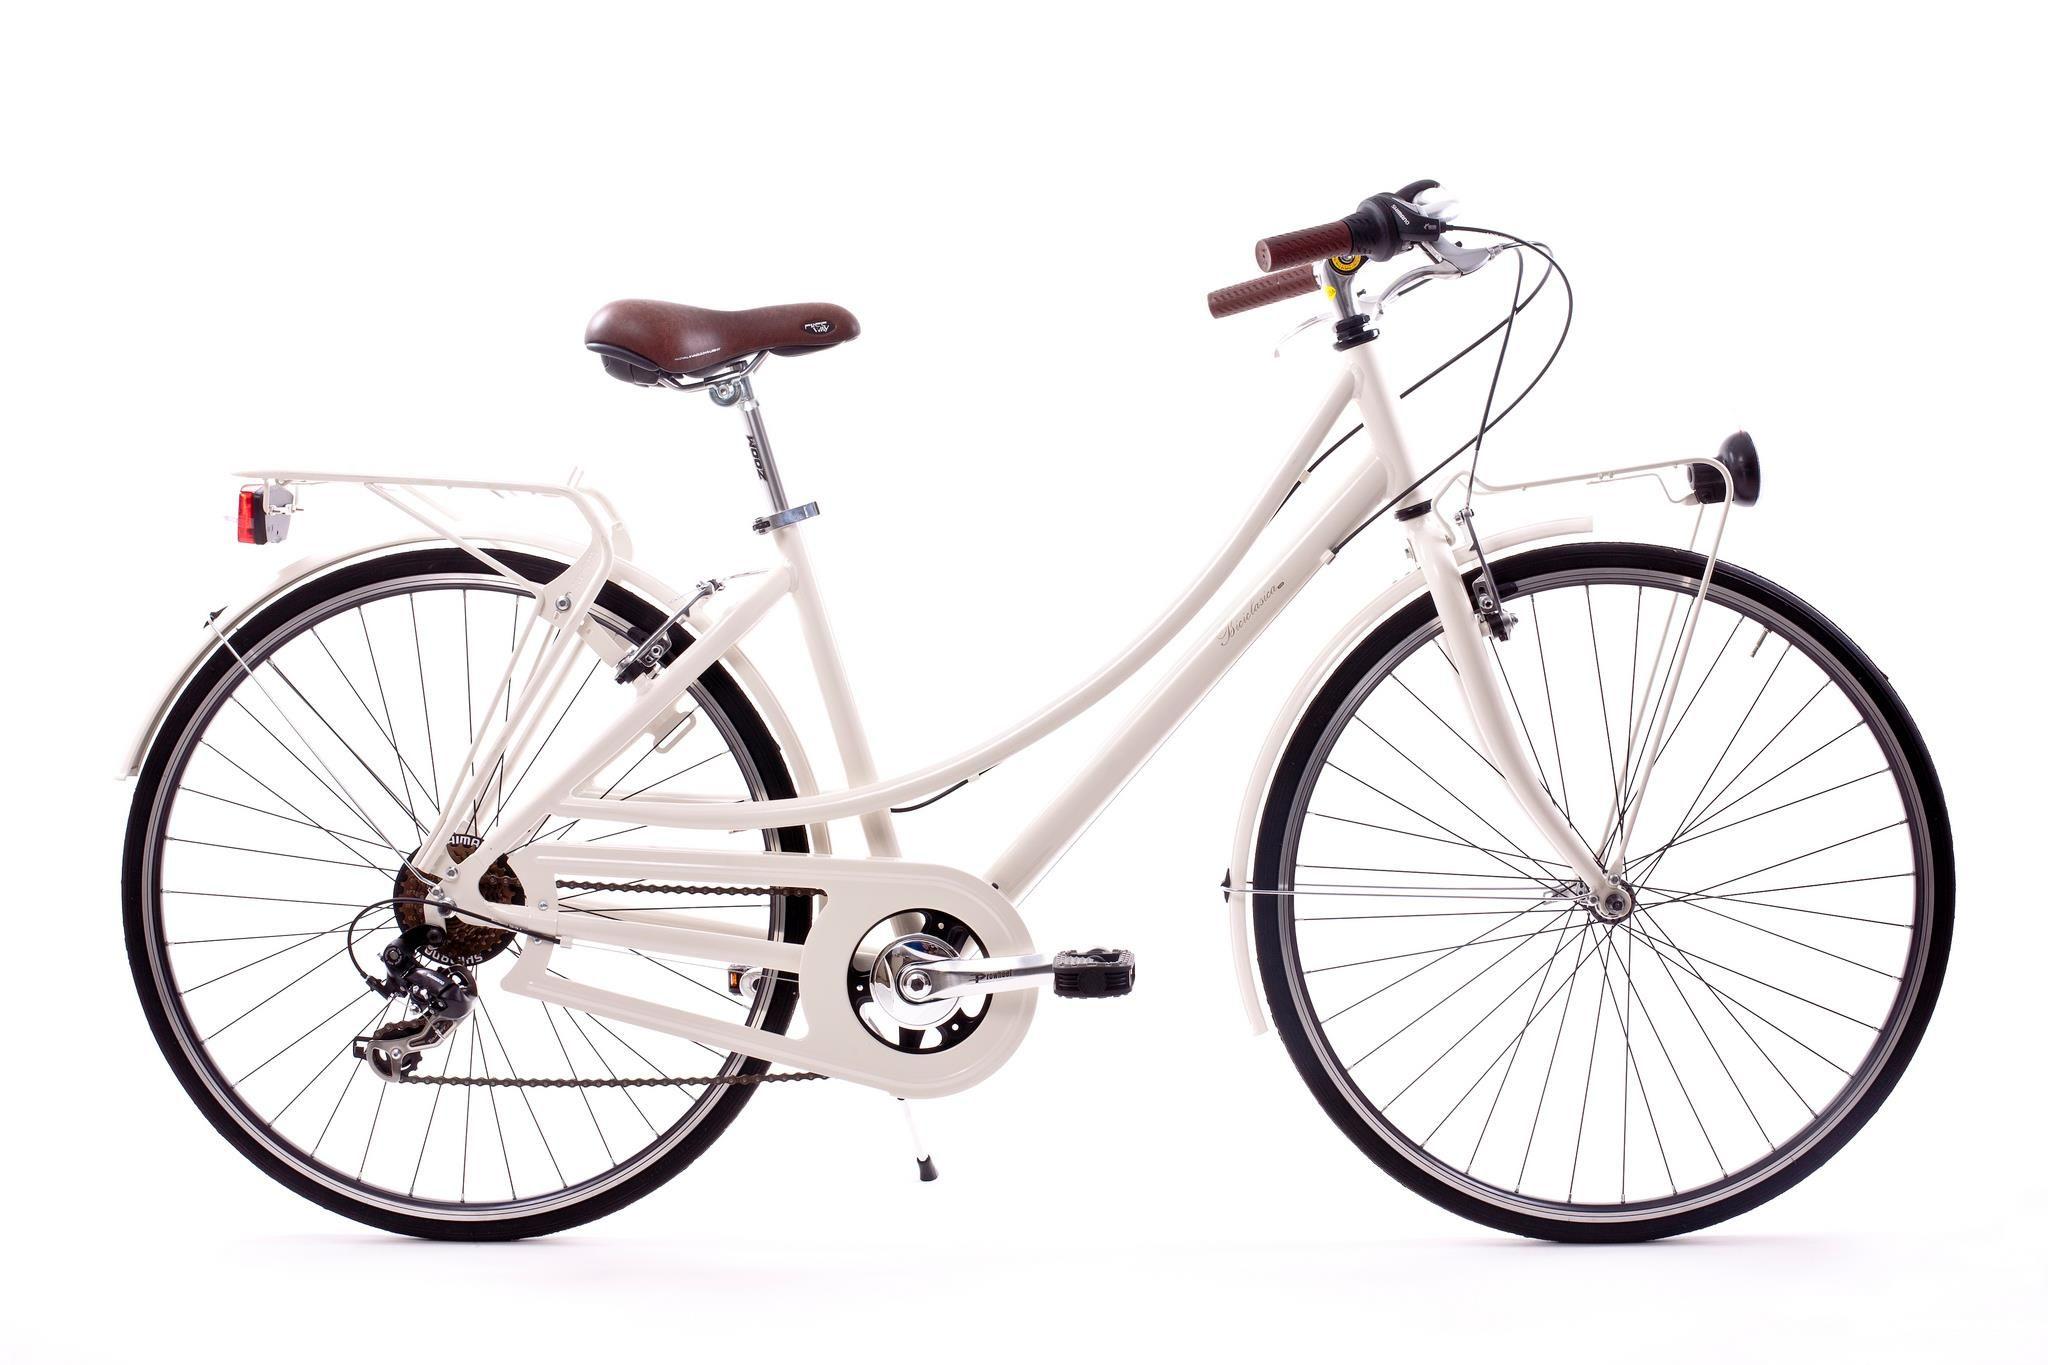 Dalia, bicicleta Retro de aluminio 7 velocidades www.biciclasica.com